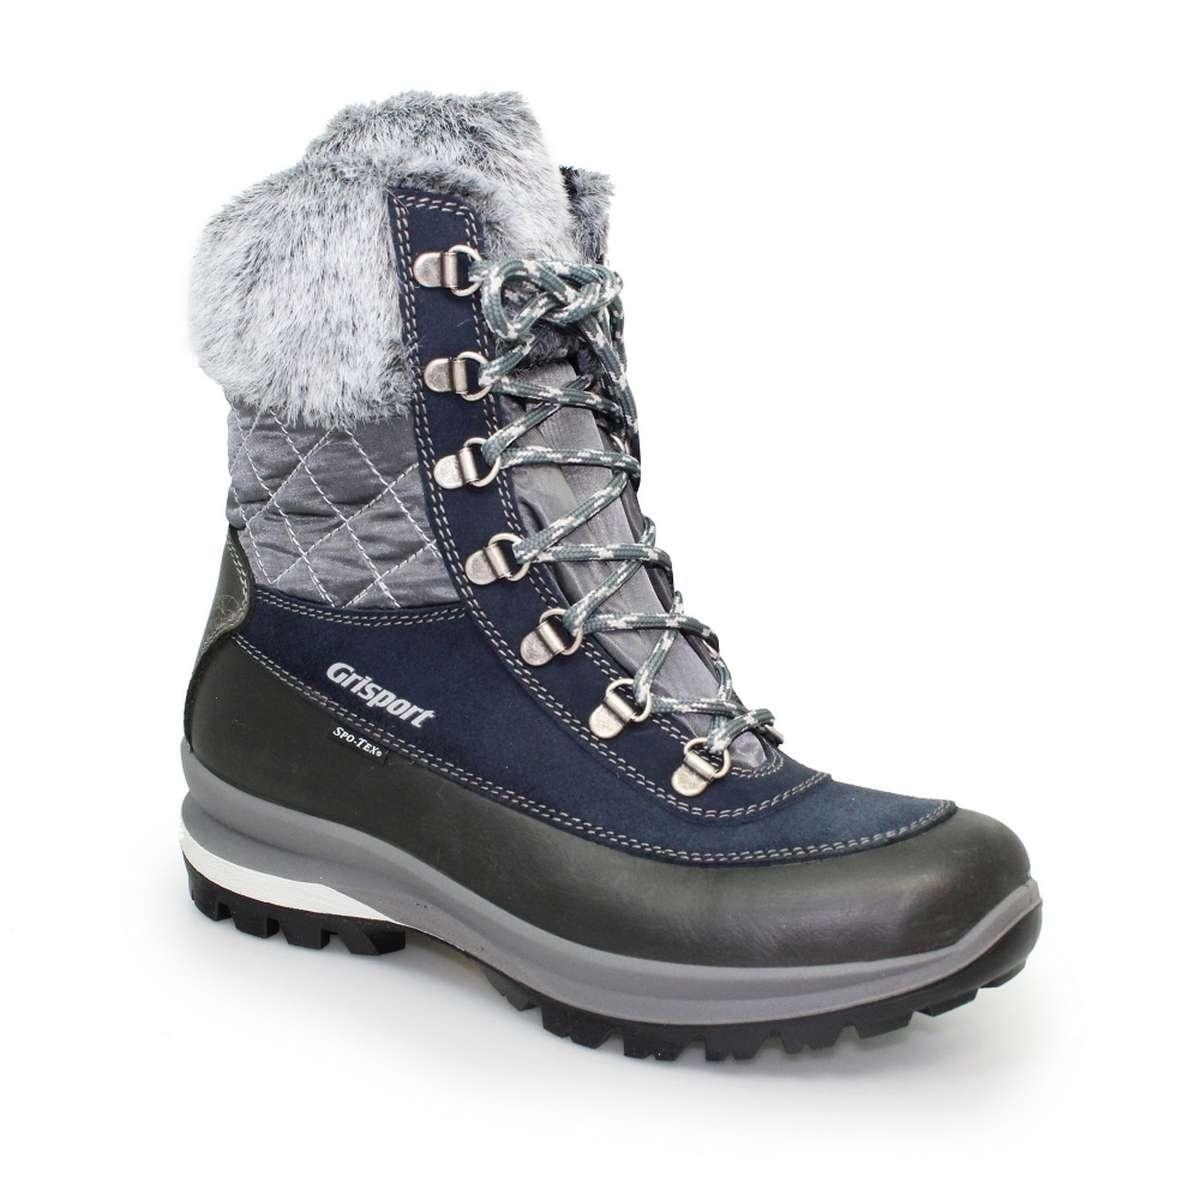 668f4e617f6 Grisport Viking Lady Boot